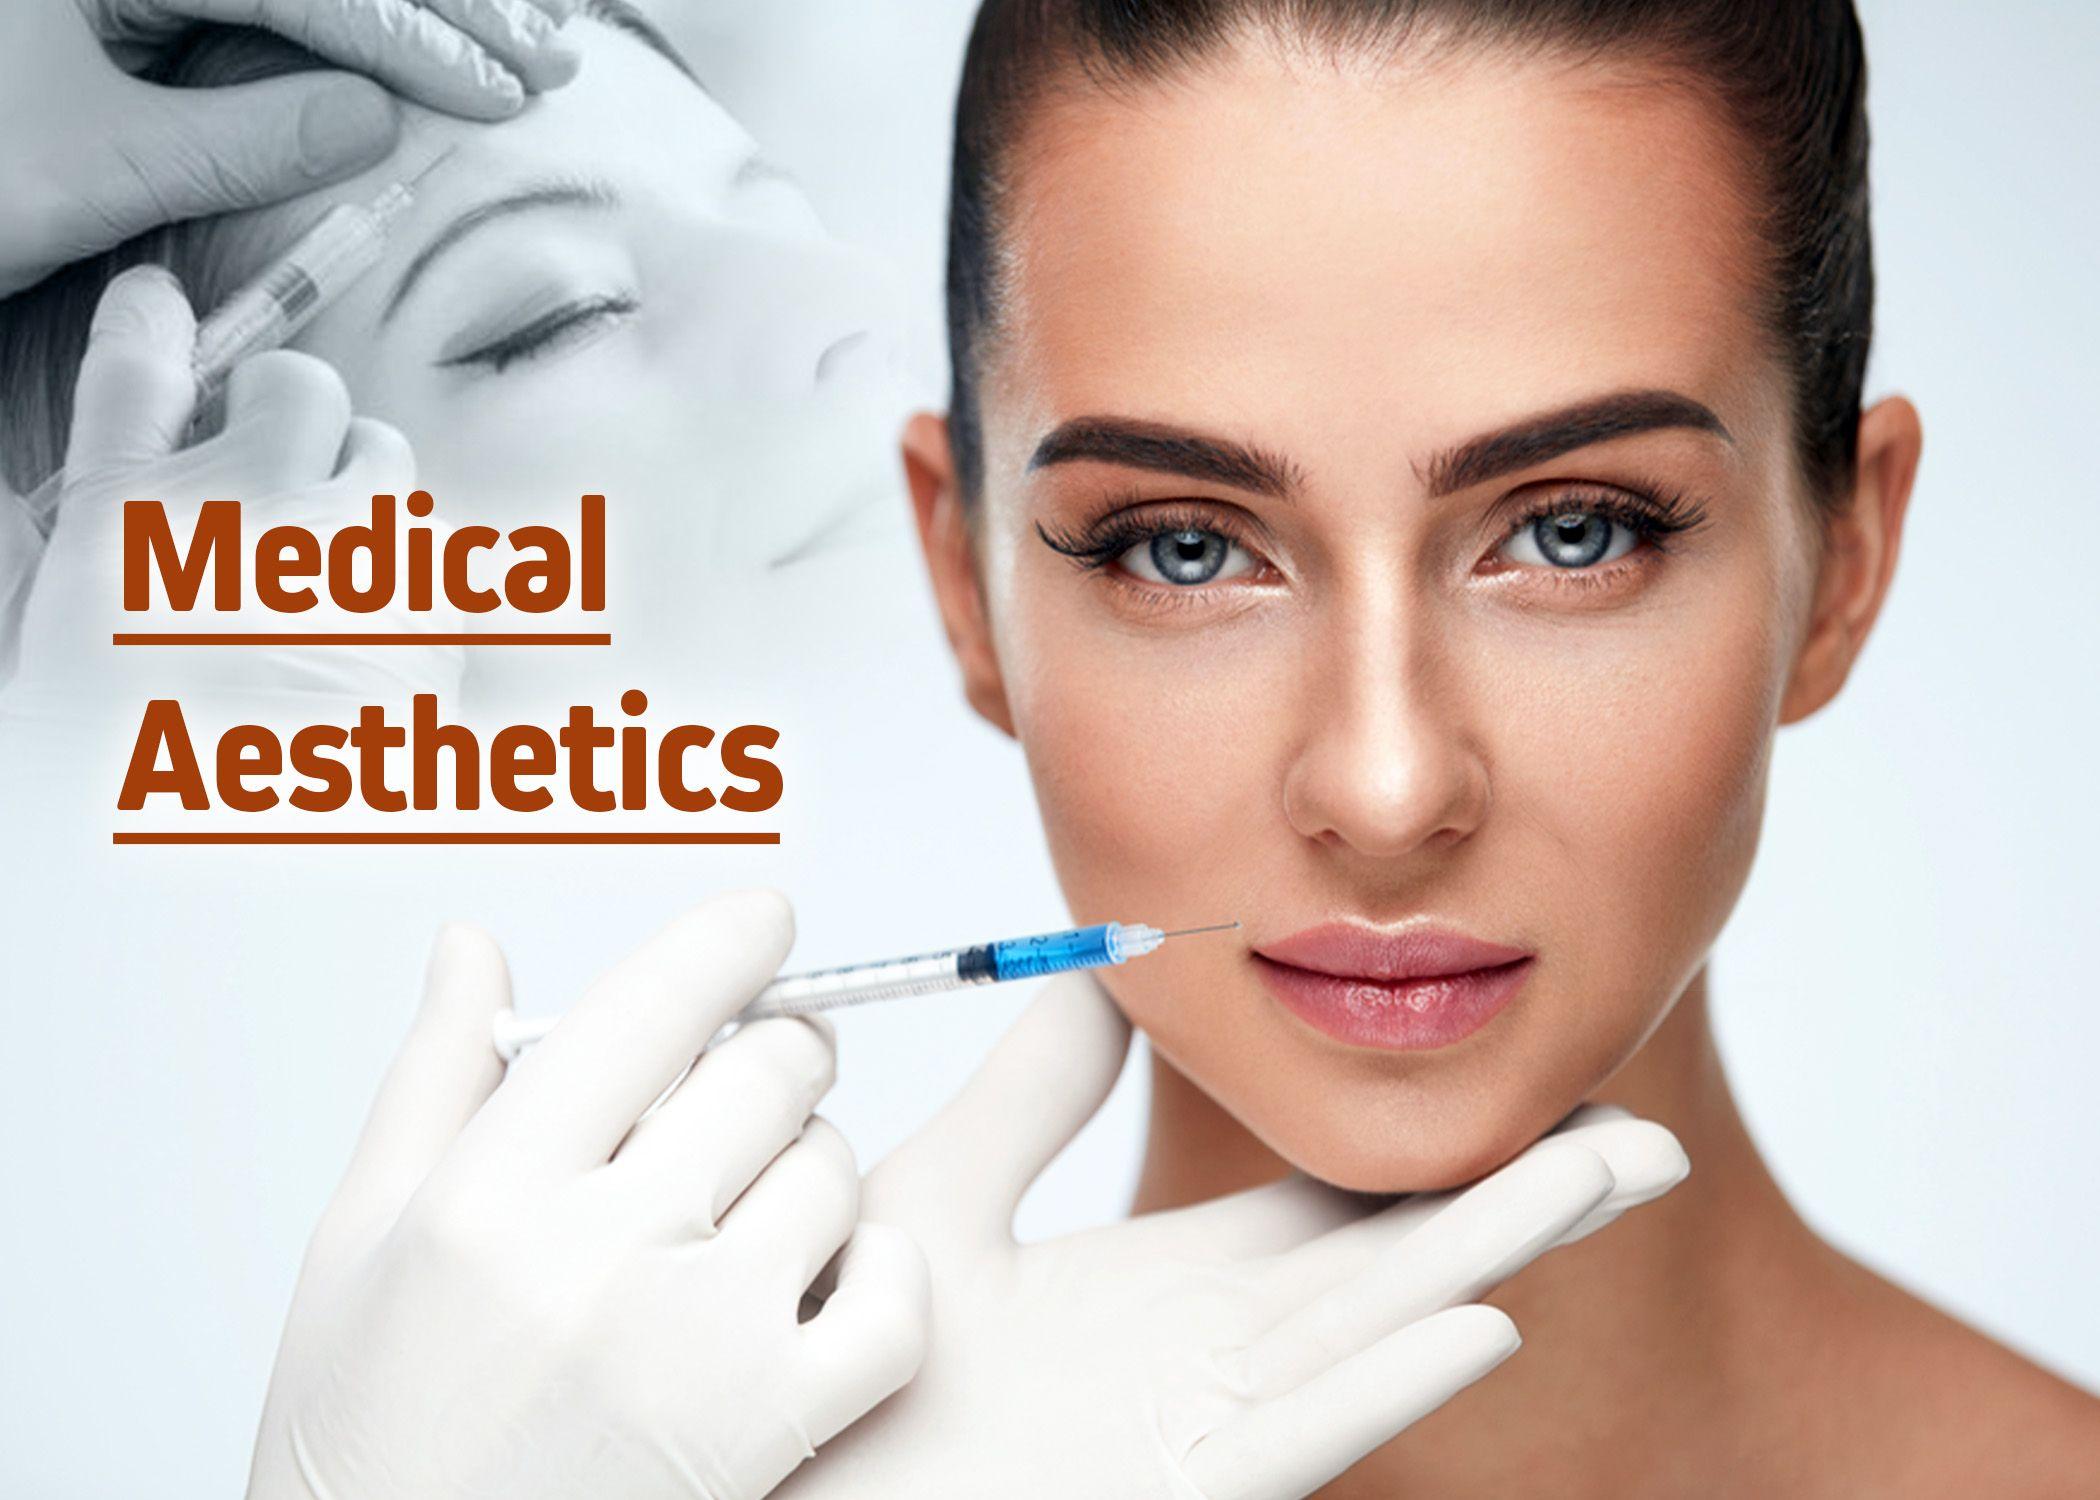 Medical Aesthetics Market Medical aesthetic, Marketing